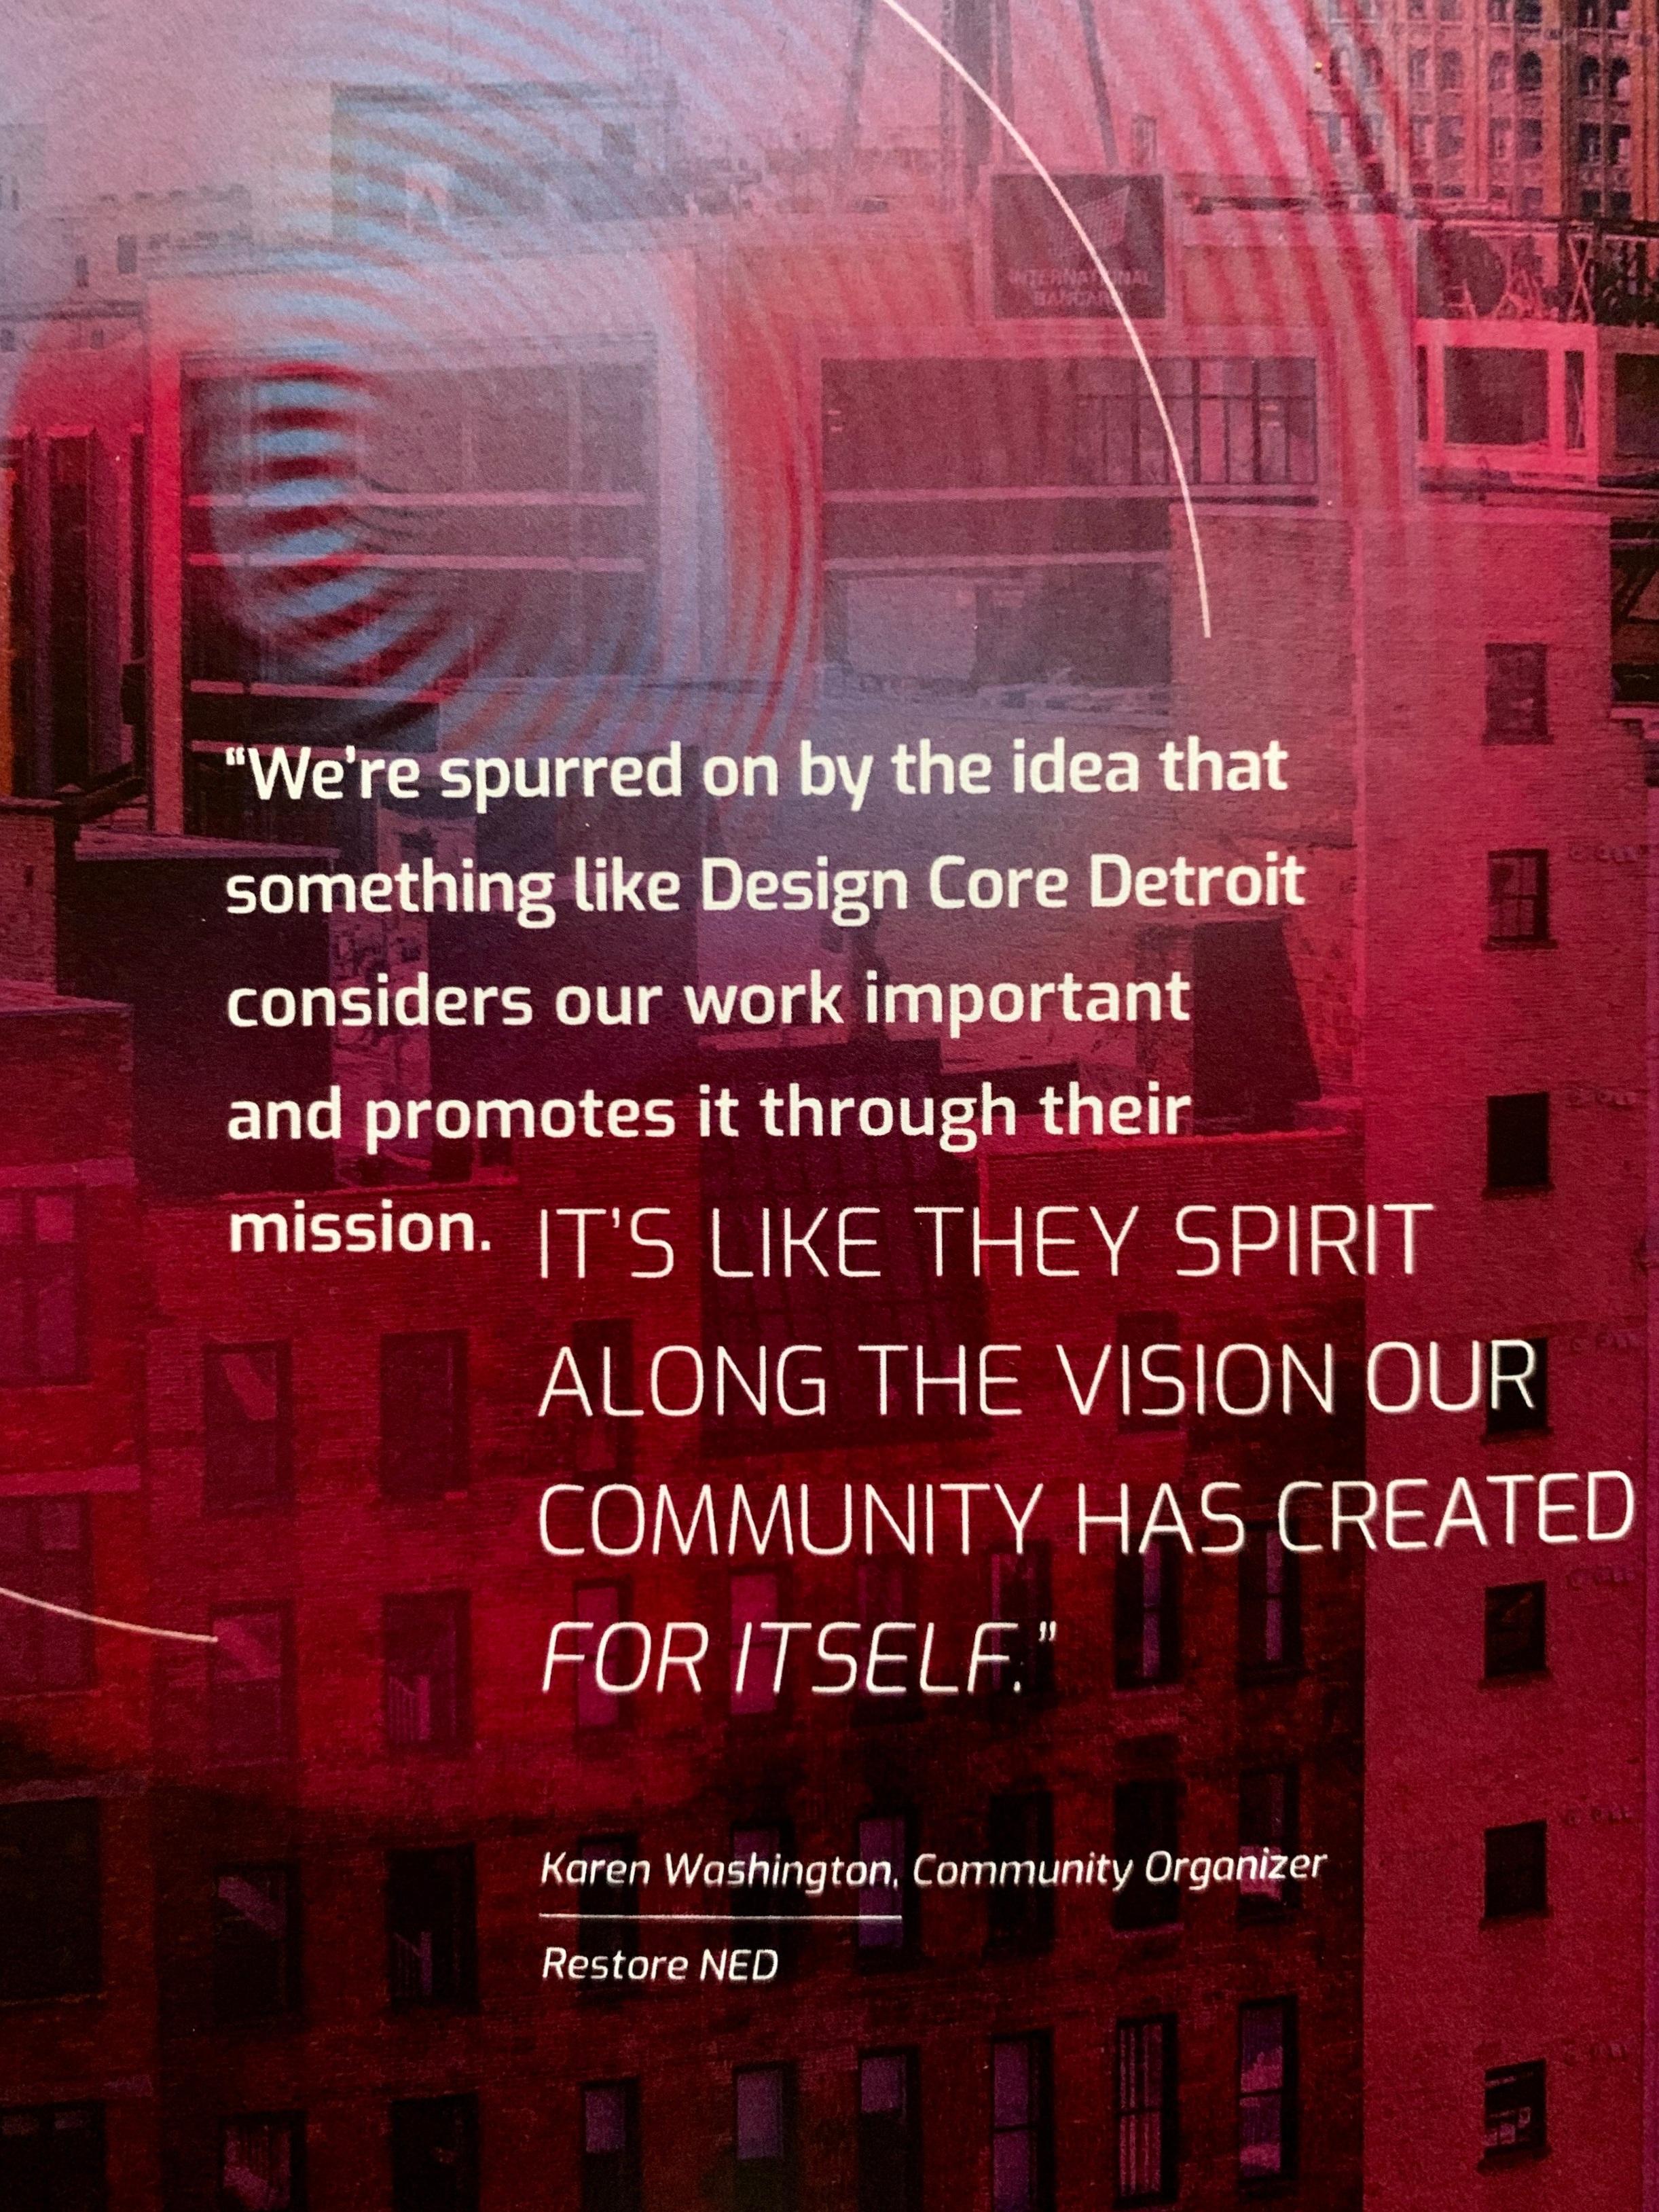 Inclusive Design Together Back Cover.JPG